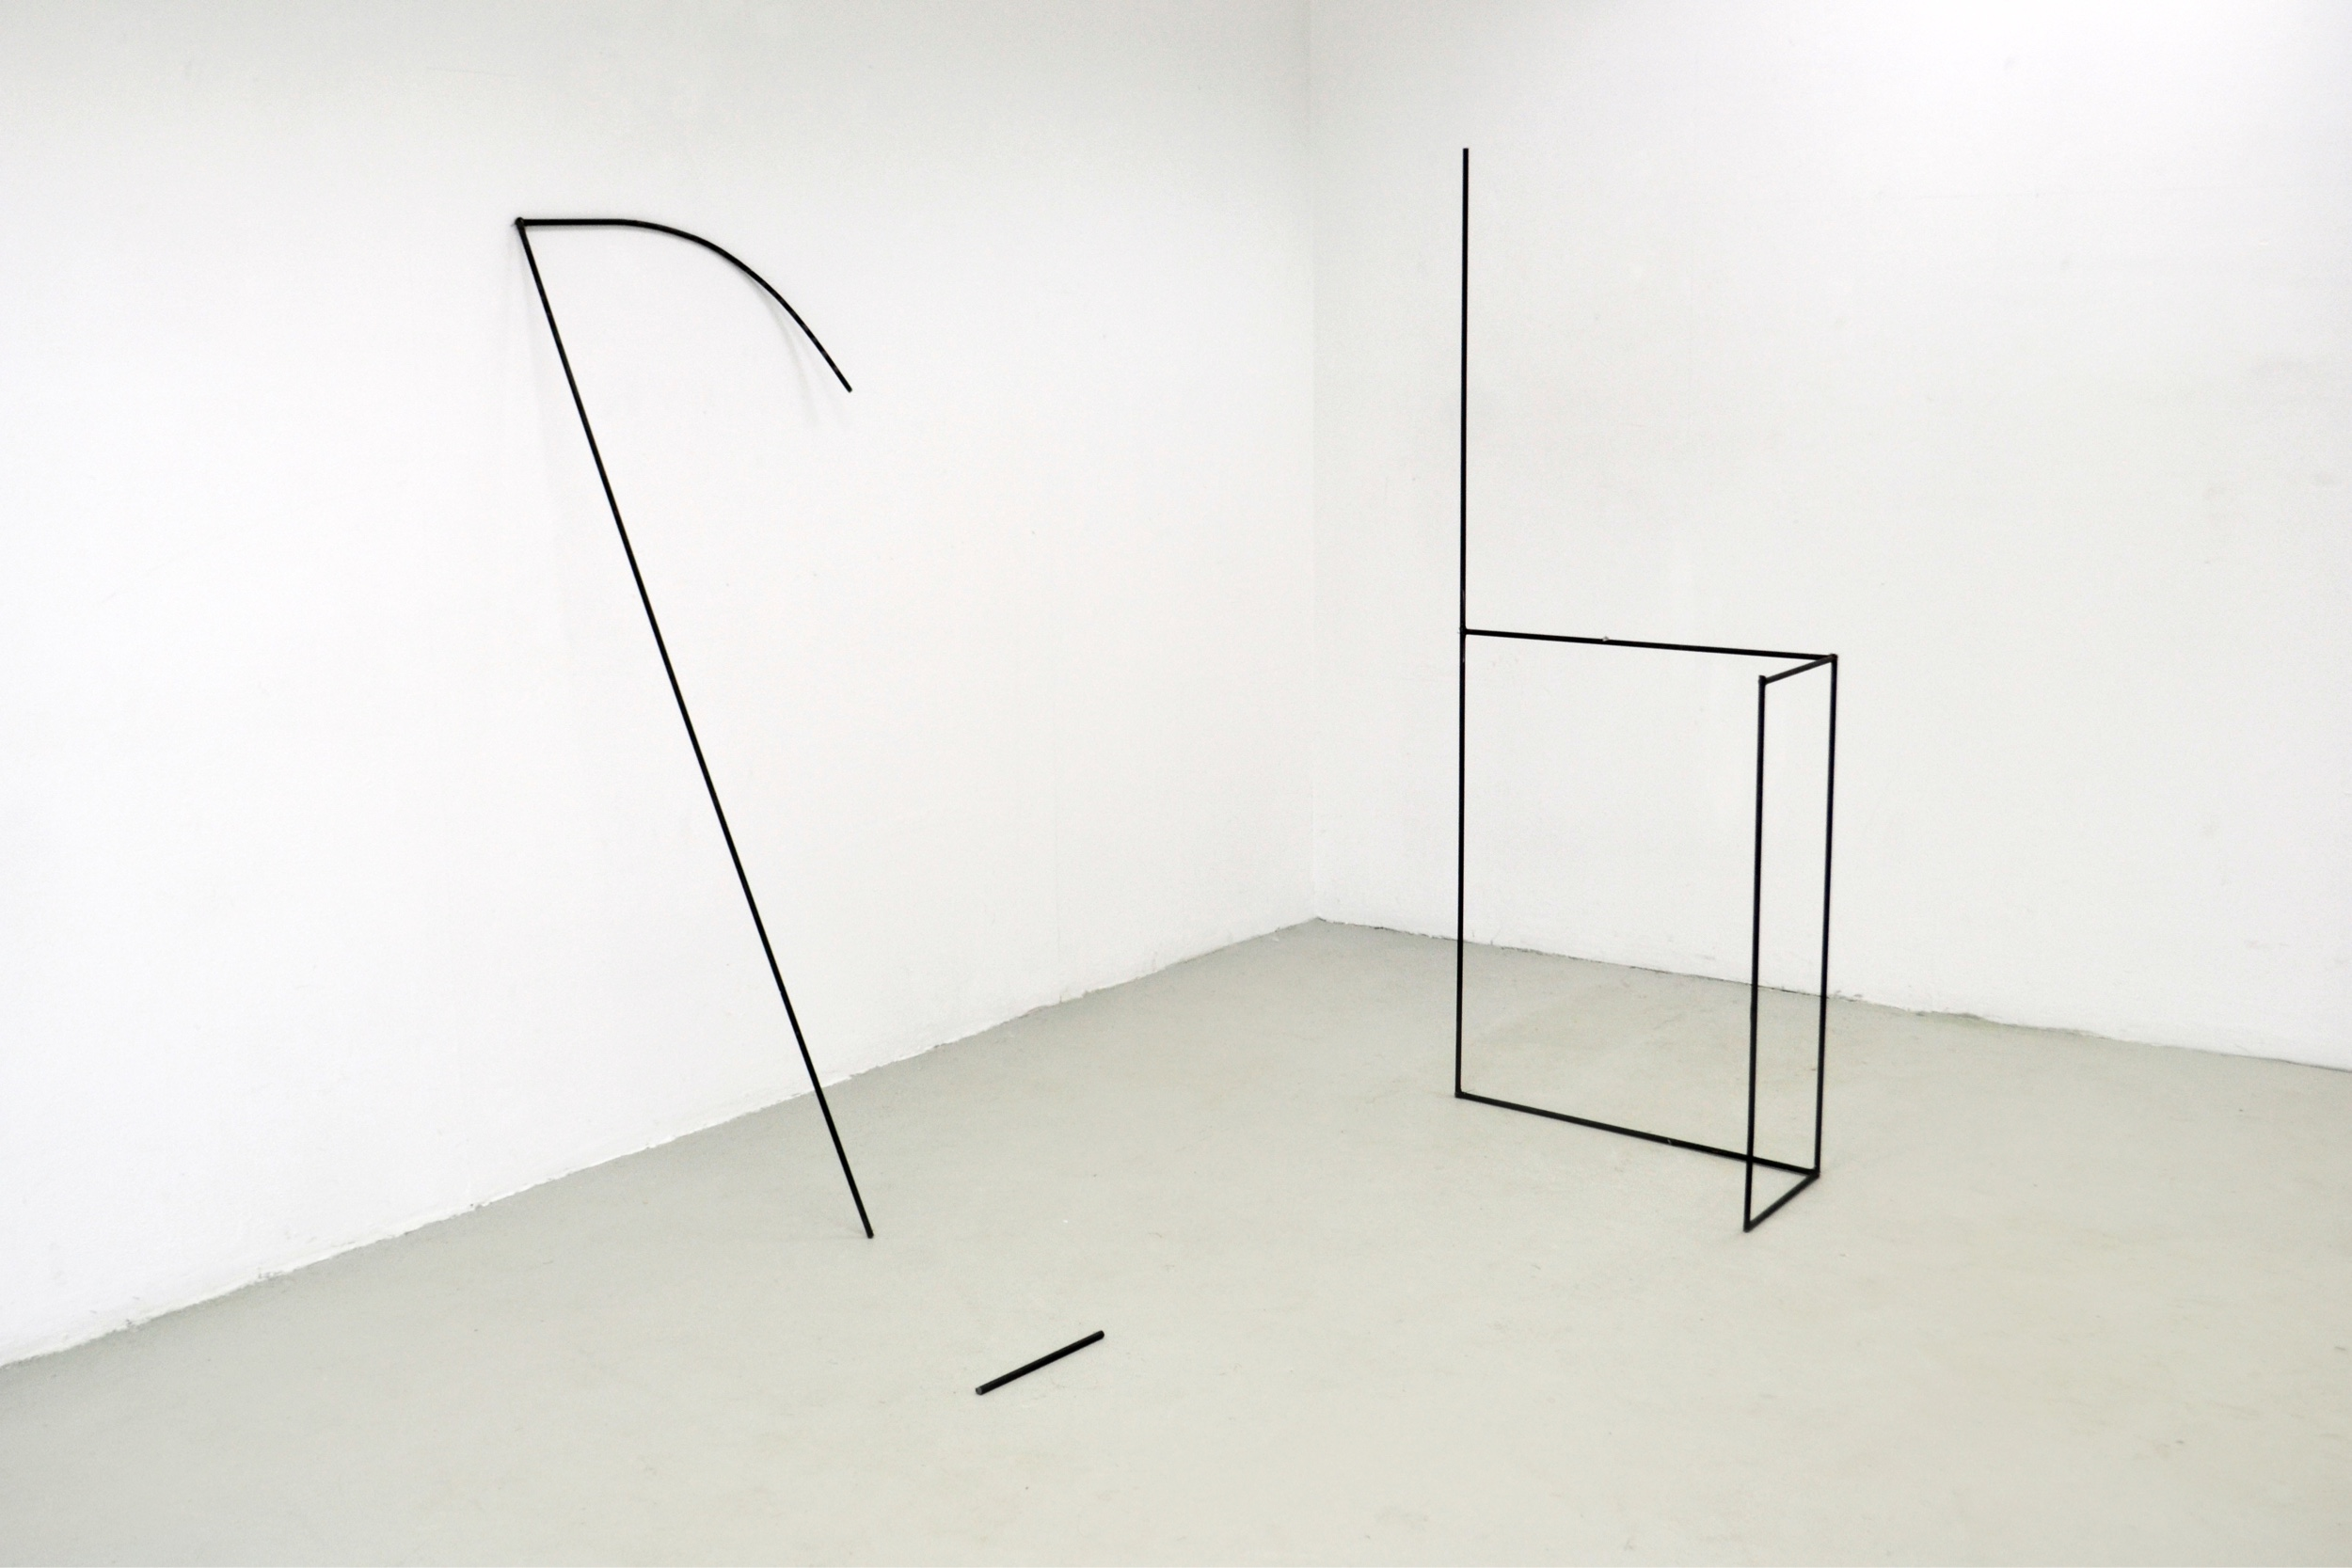 Platonic Solid, Camille Yvert, 2015